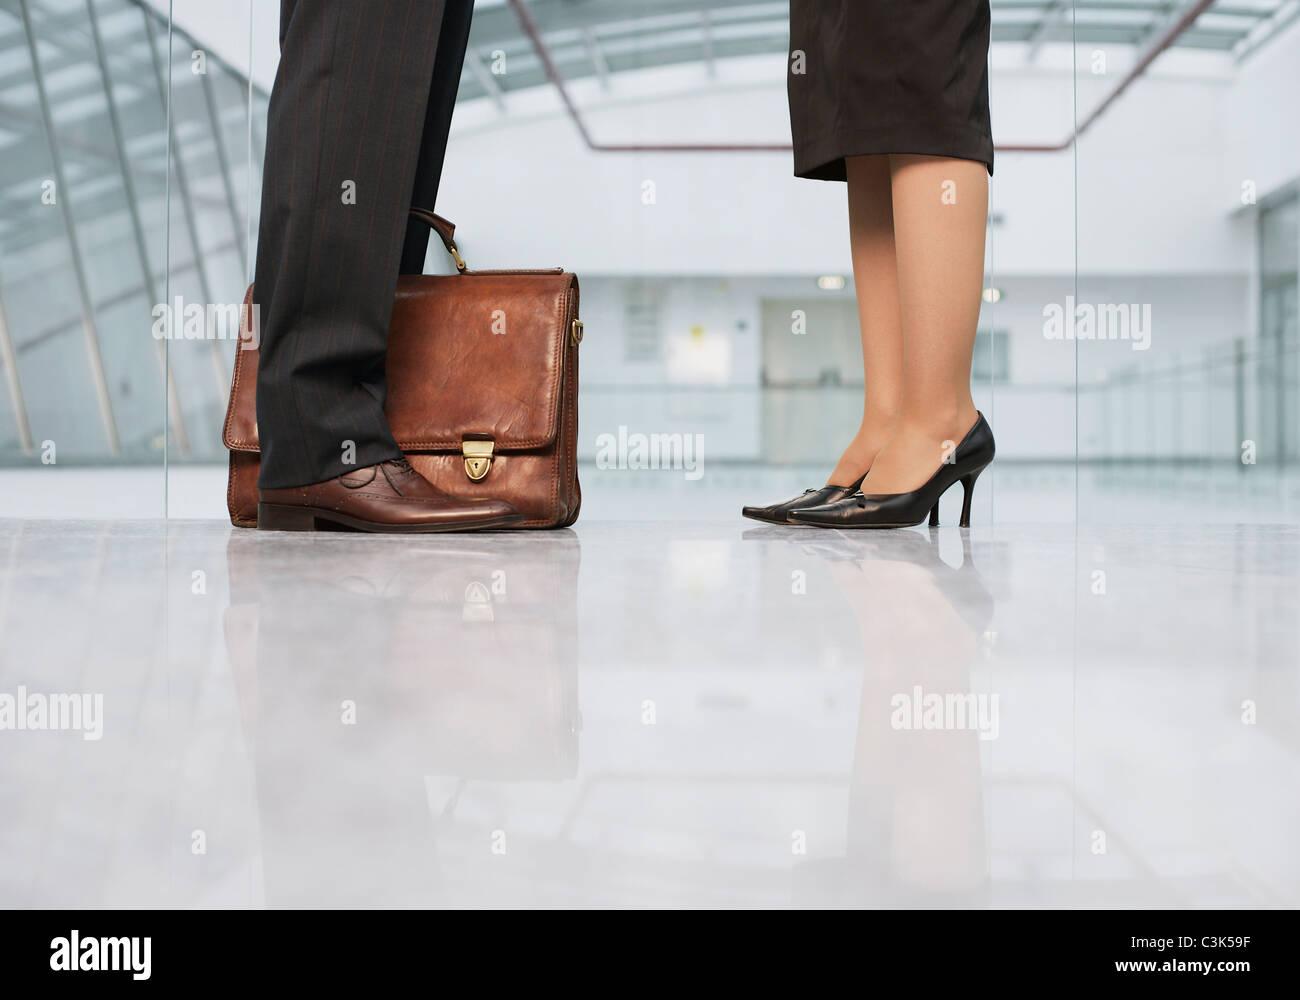 Business people standing on shiny floor - Stock Image